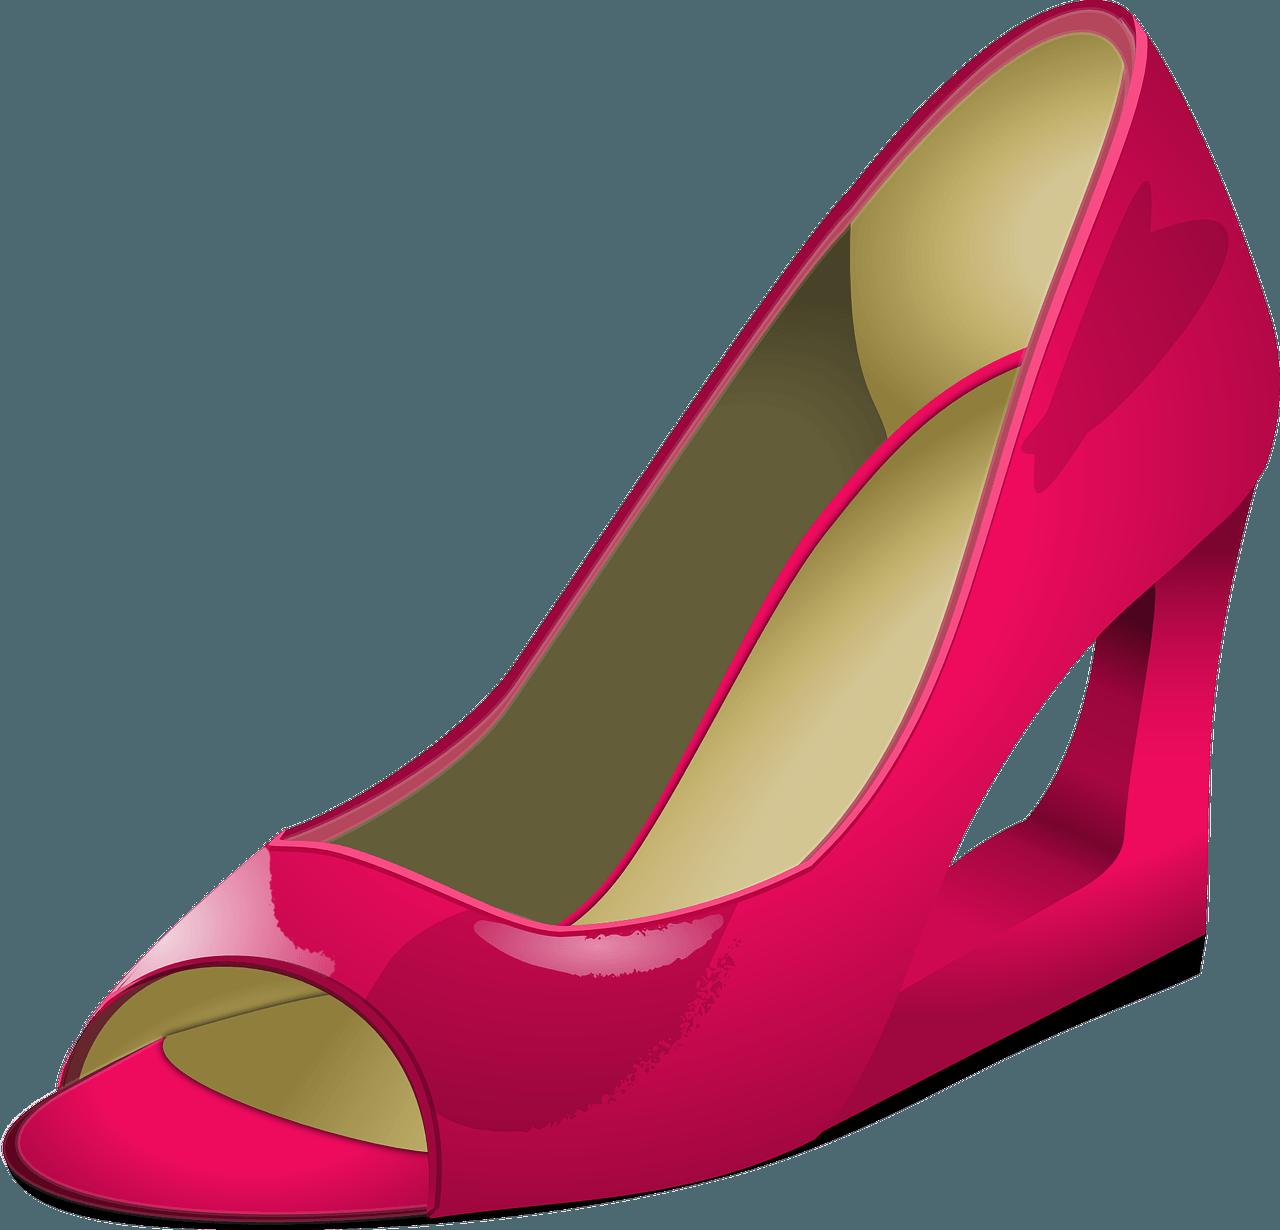 Heels clipart stilettos. Get high with top